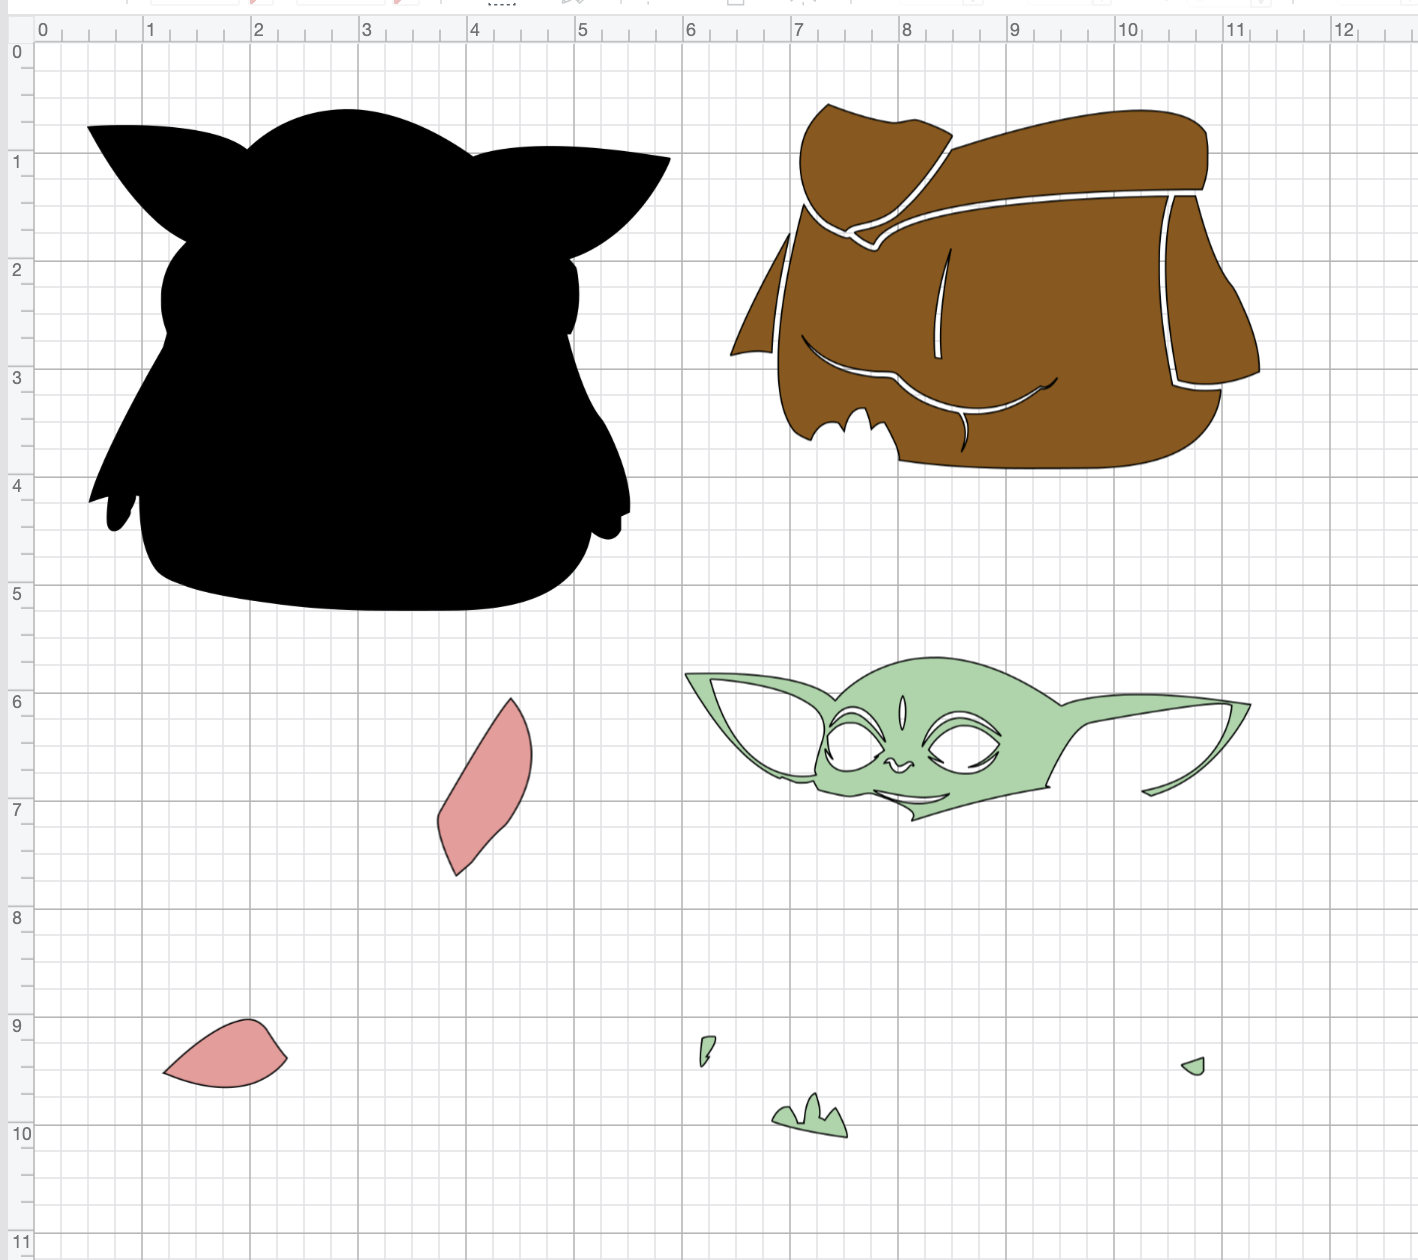 Baby Yoda SVG for Cricut Cricut, Crafts, Cricut creations